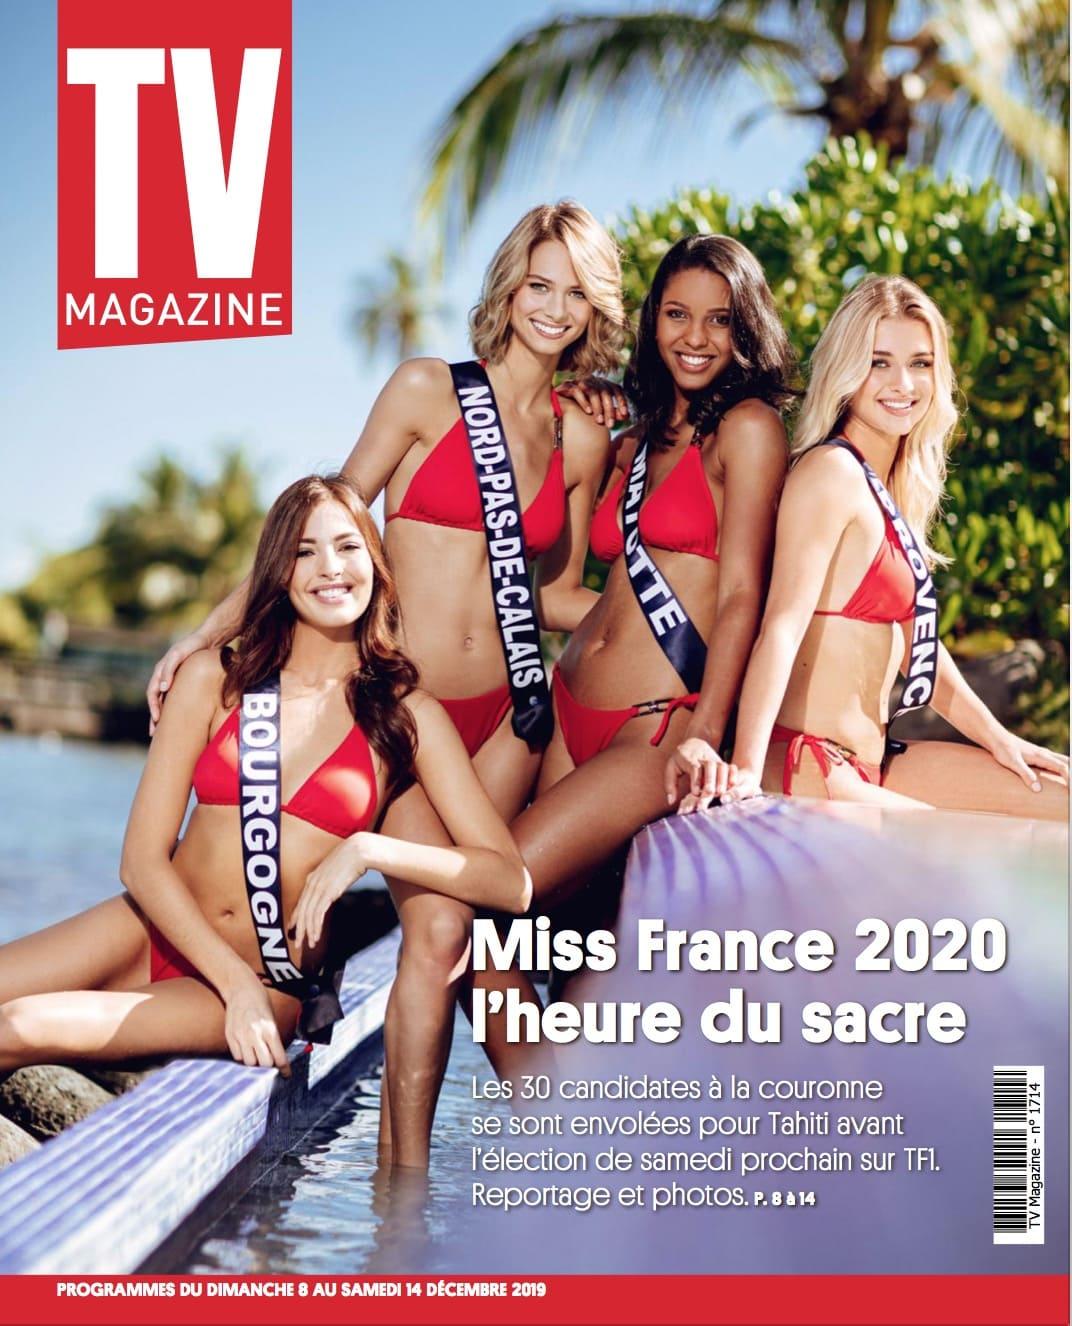 aurore-donguy-tv-magazine-1